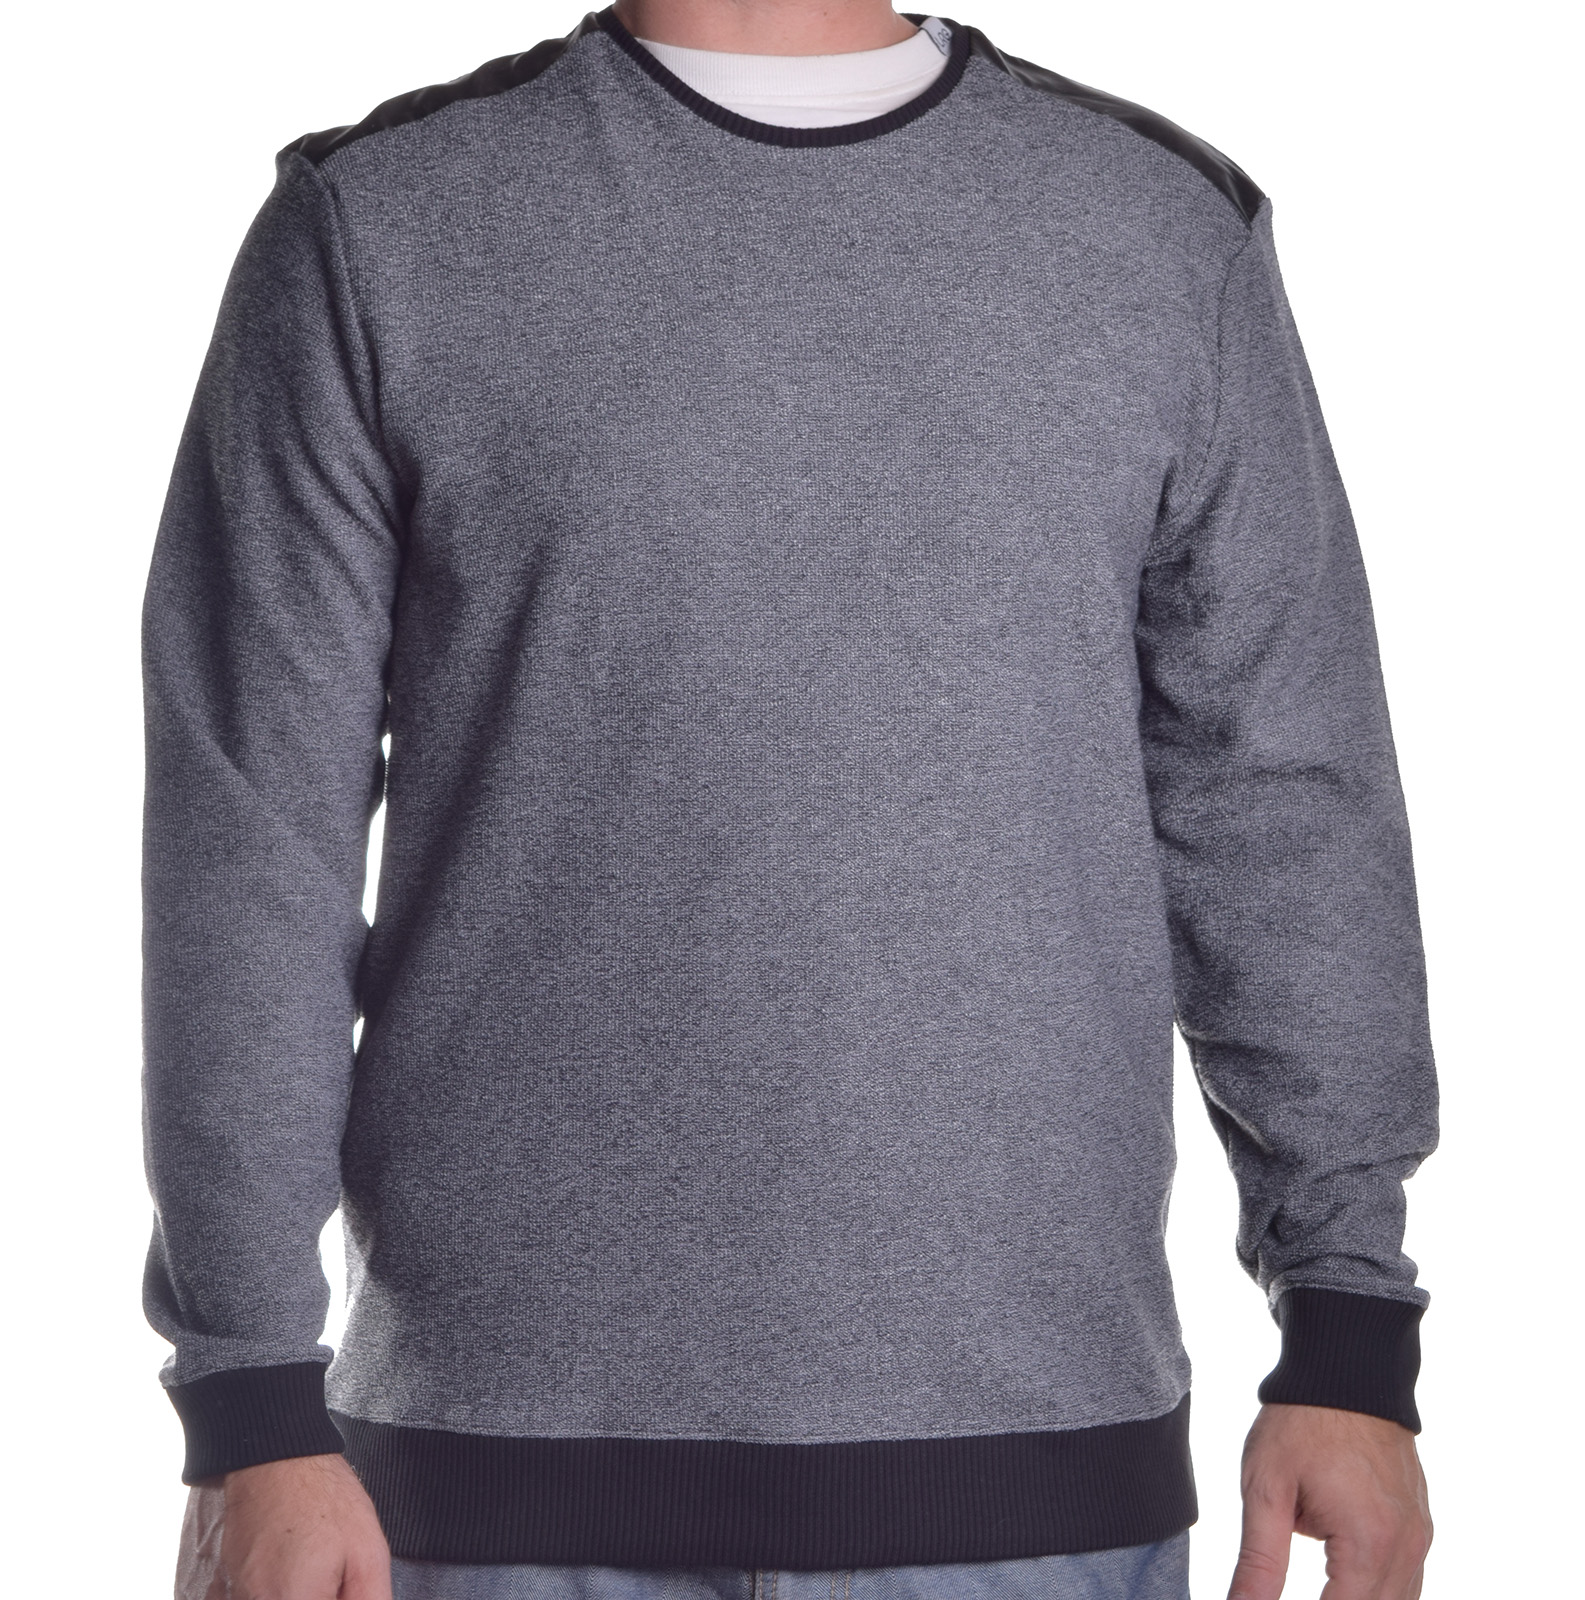 Pull Over Onto Shoulder : Calvin klein men s faux leather shoulder pull over sweater